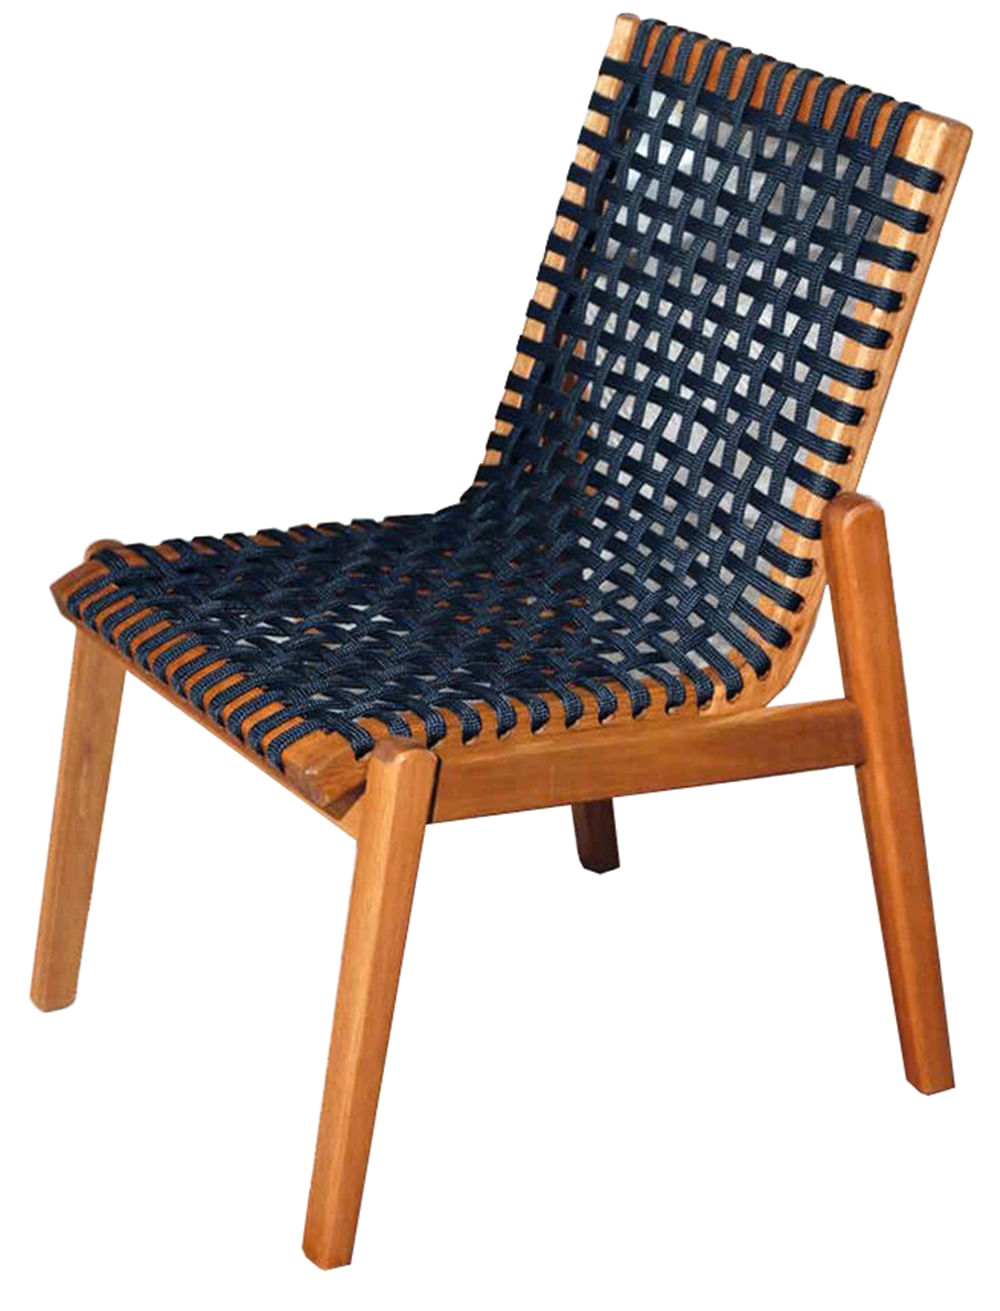 Cadeira Trama Corda Preta Estrutura Stain Jatoba 52cm - 53172